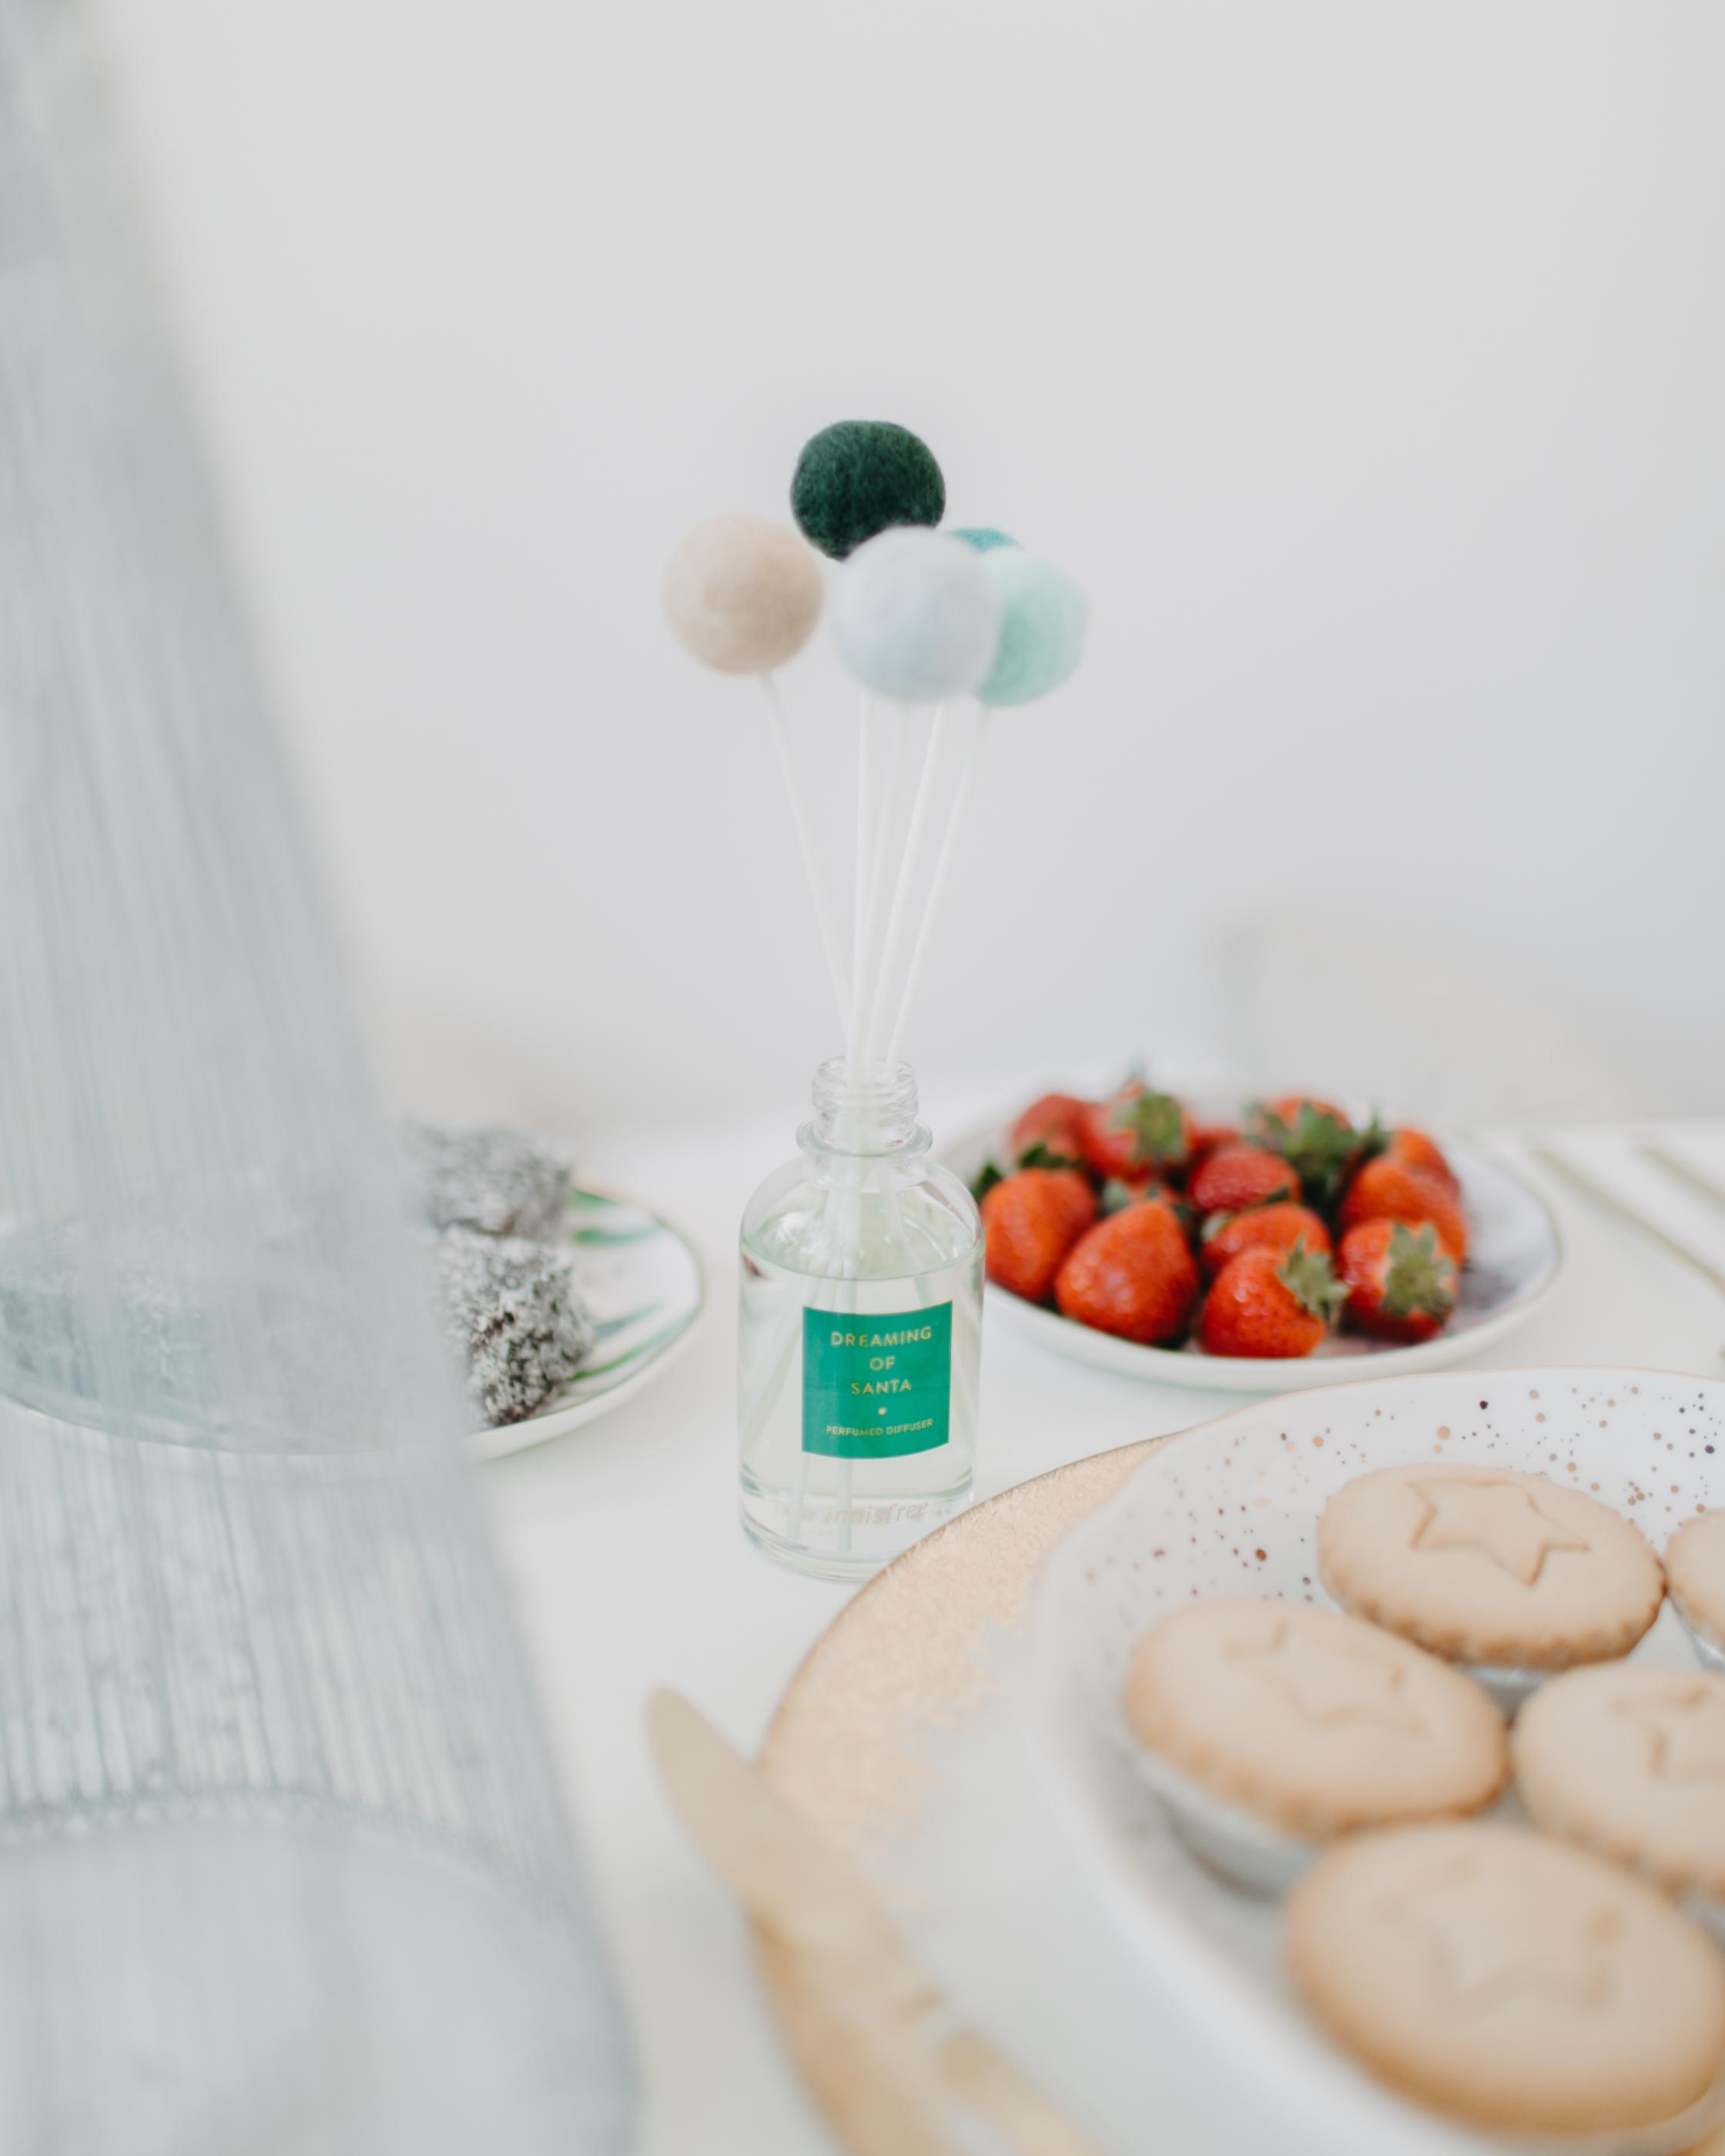 Dreaming of Santa Perfumed Diffuser   Festive, limited-edition clean soapy mush perfumed diffuser.